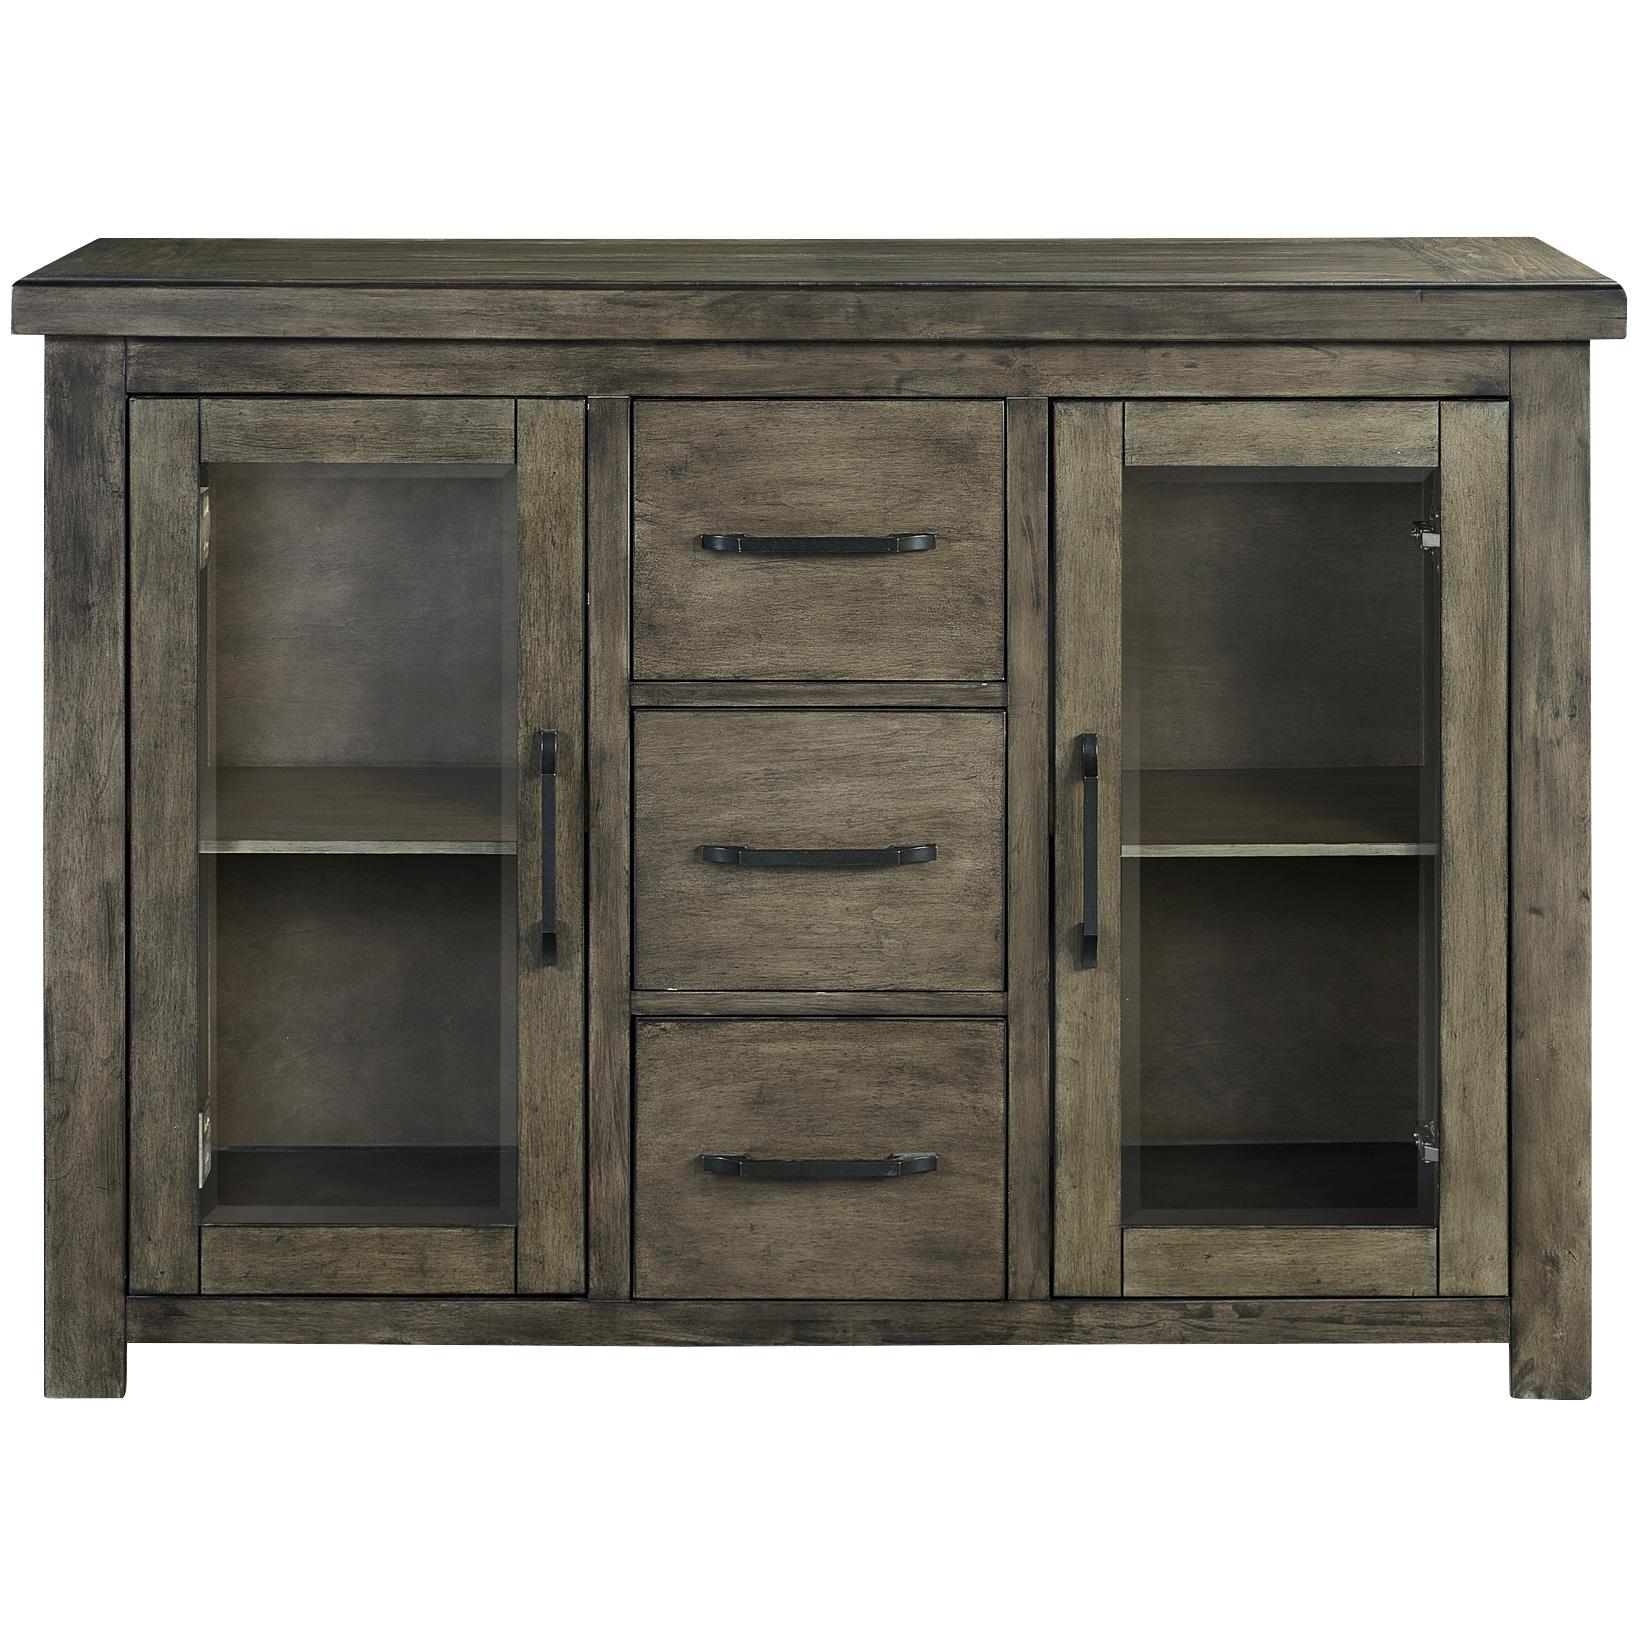 Whalen Furniture | Lawton Rustic Brown Server